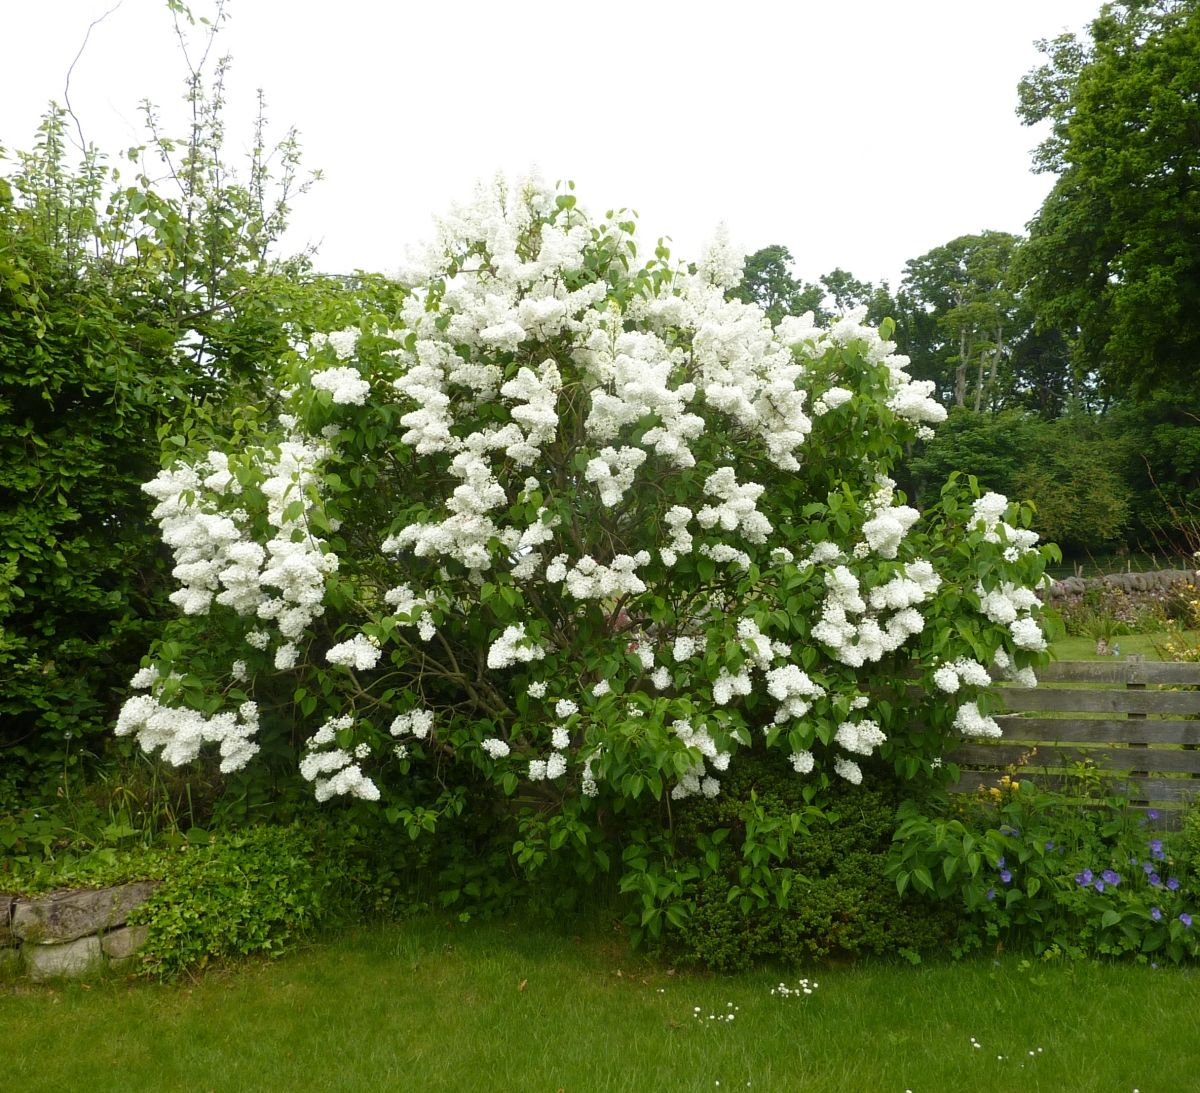 Syringa vulgaris mme lemoine considered one of the - Syringa vulgaris ...